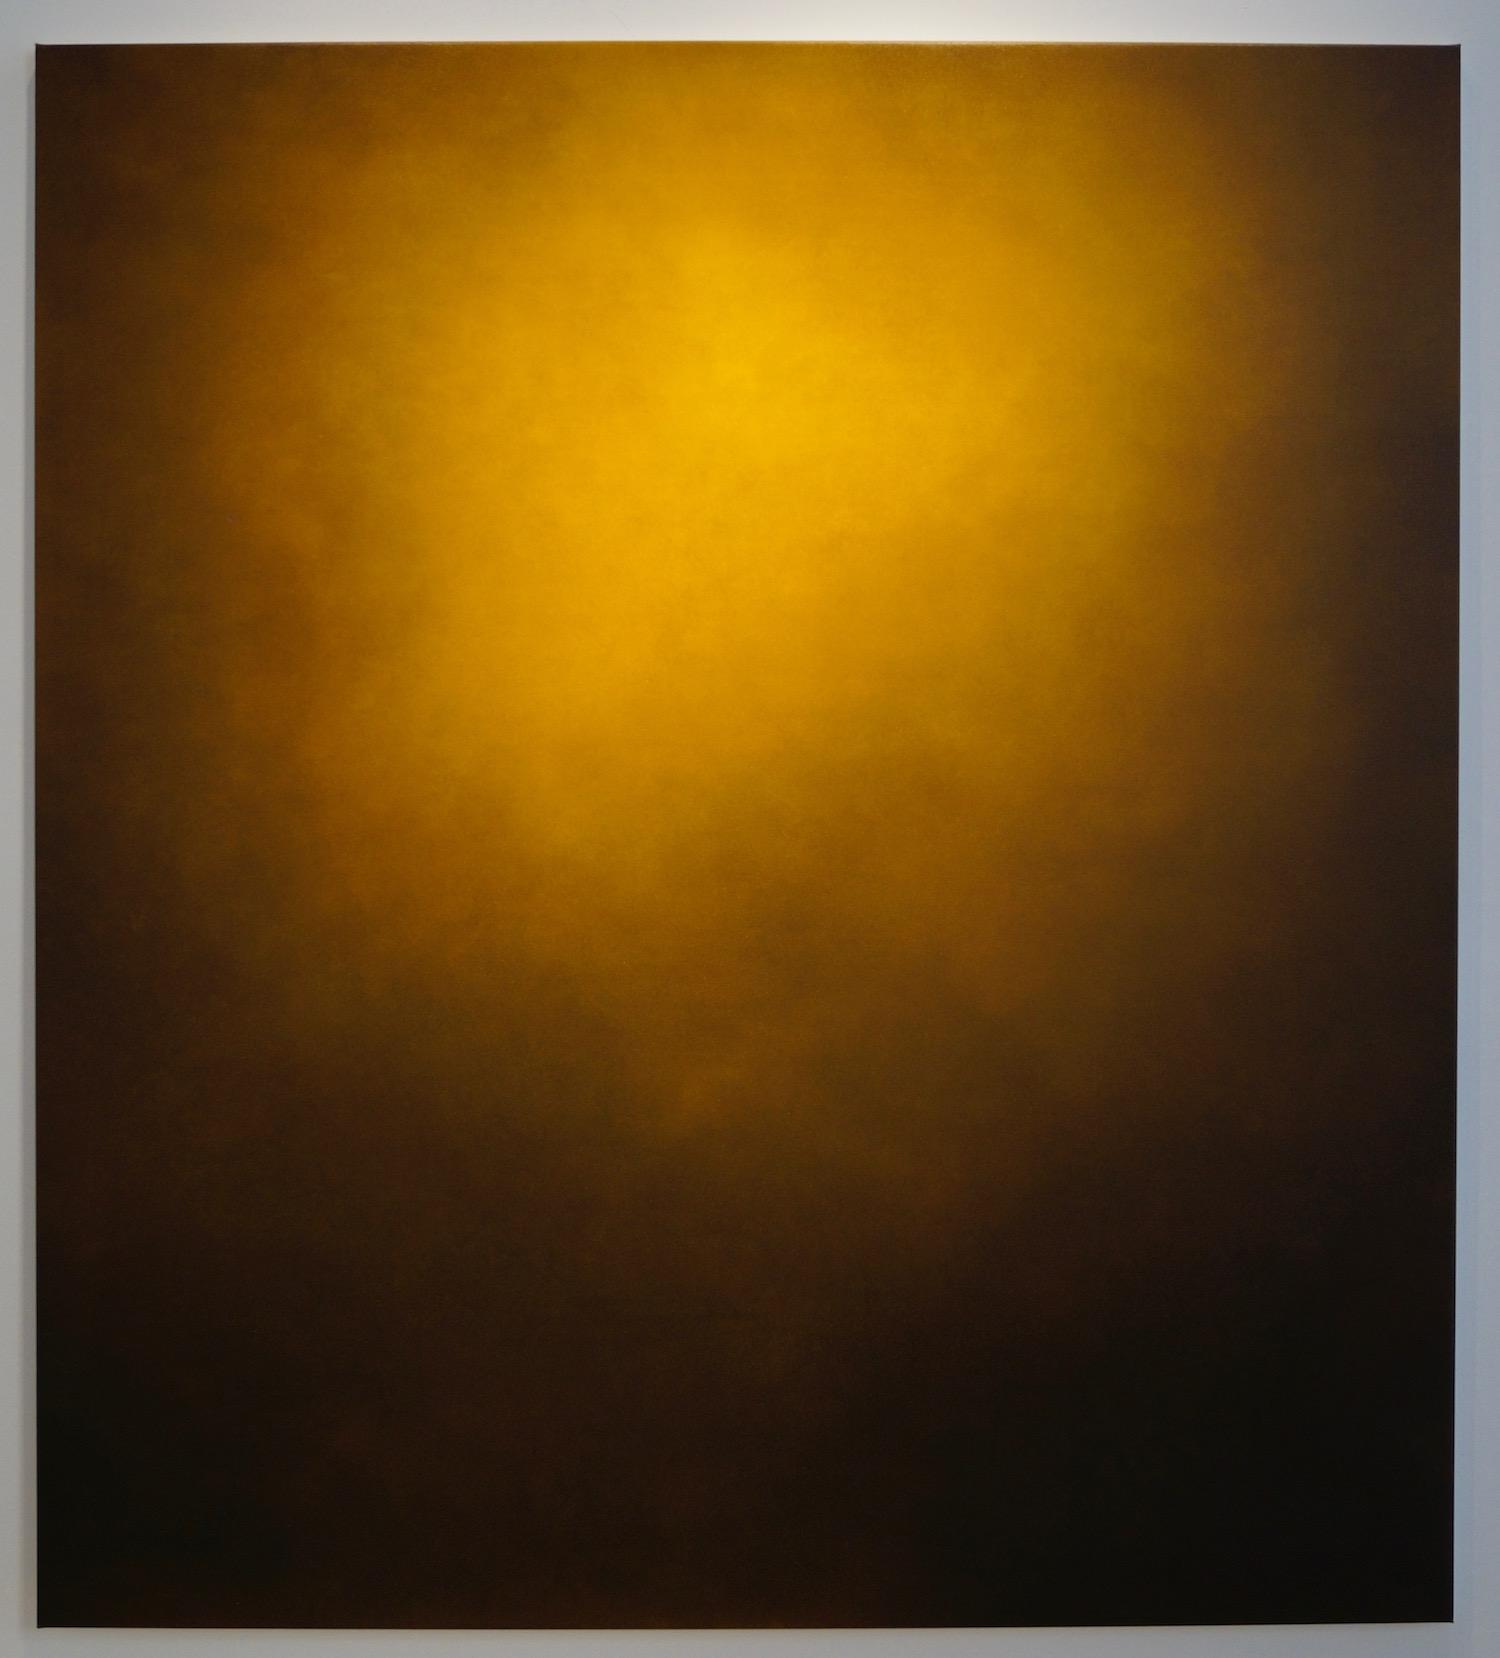 Magnus Thorén untitled, 2017 oil on canvas 190 x 170 cm MTH/M 58